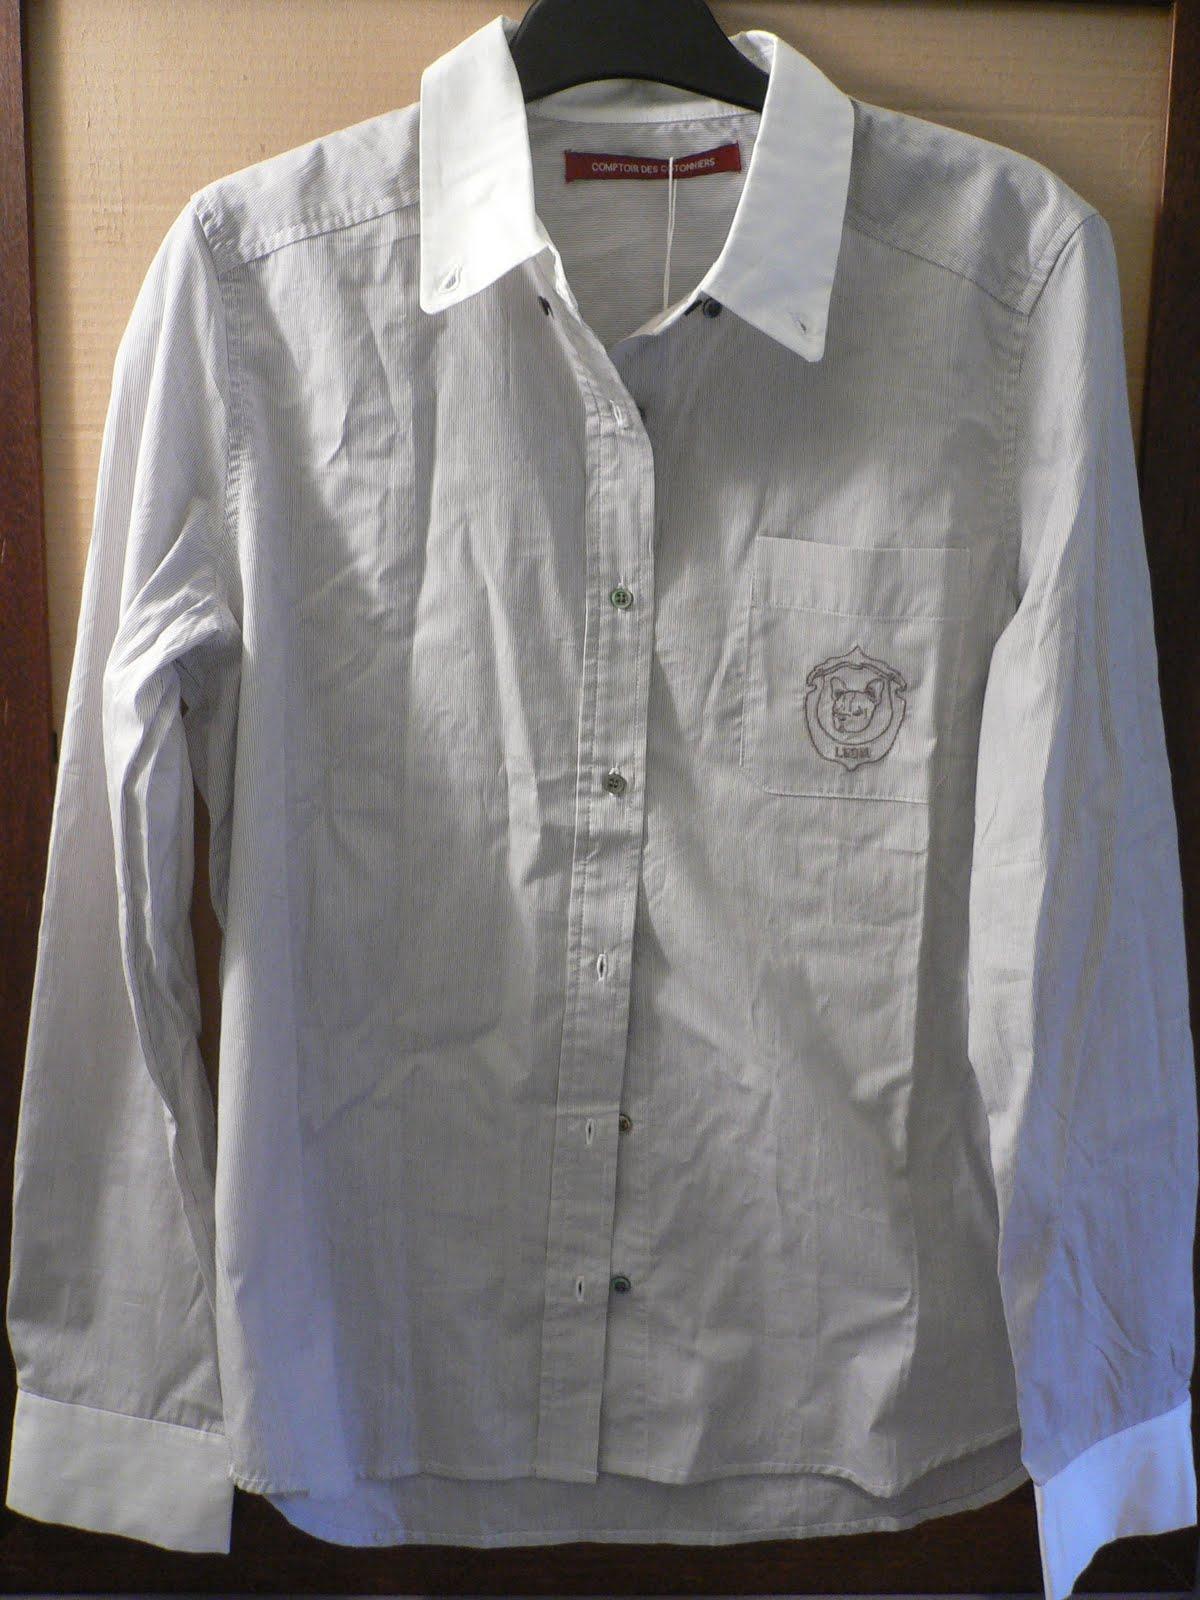 Le dressing de madame coco chemise comptoir des cotonniers - Tunique comptoir des cotonniers ...